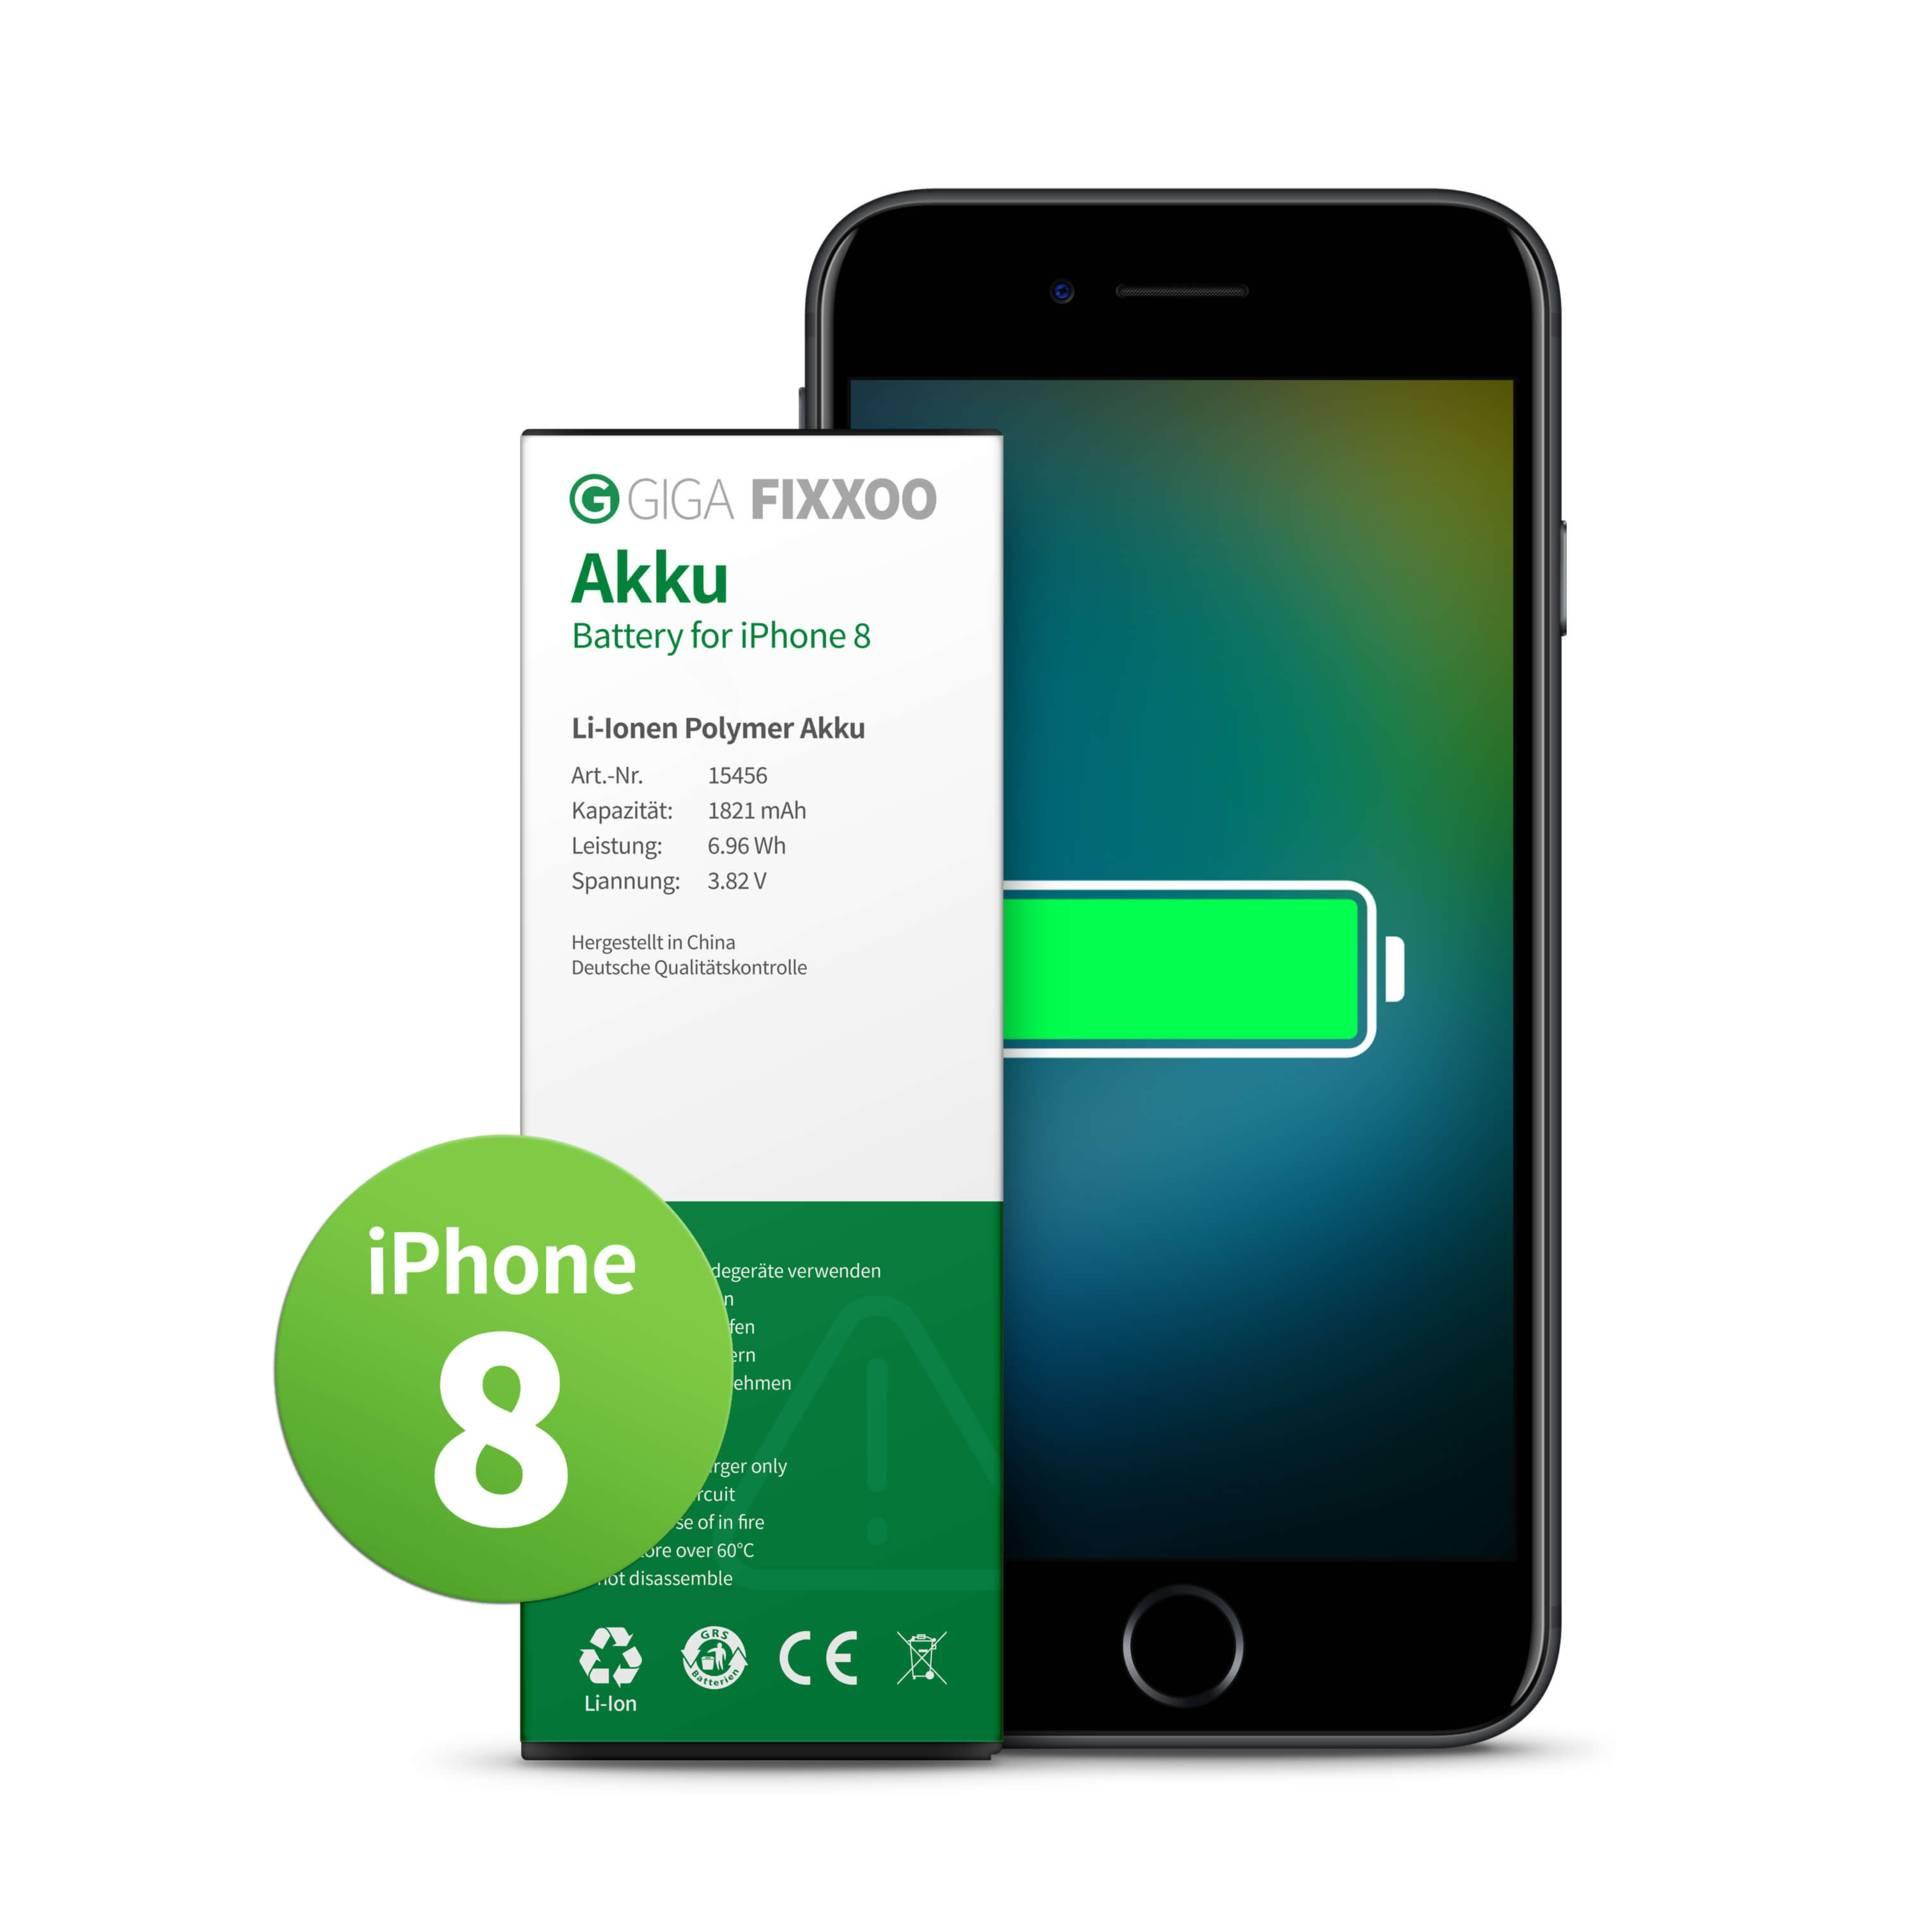 GIGA Fixxoo iPhone 8 Akku